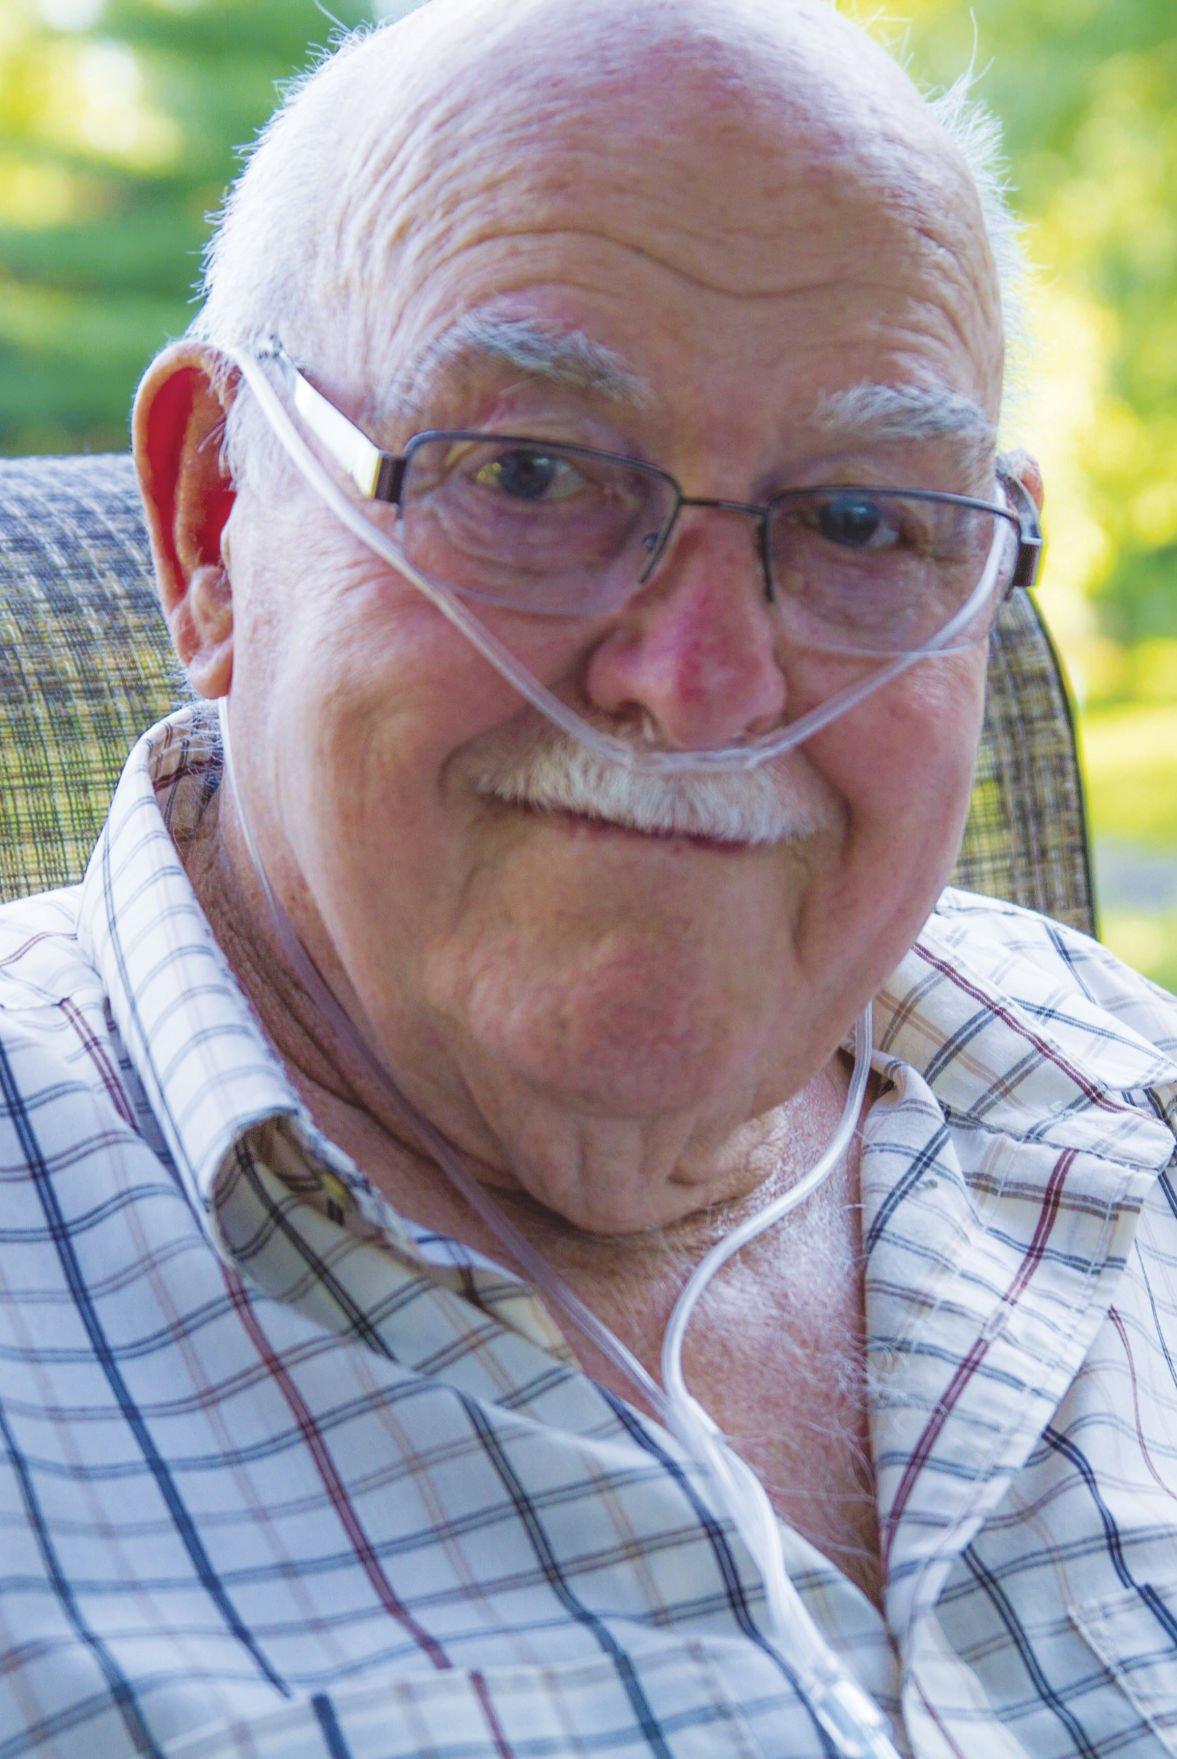 19-09-04 OBIT Jack Toothman 1.jpg